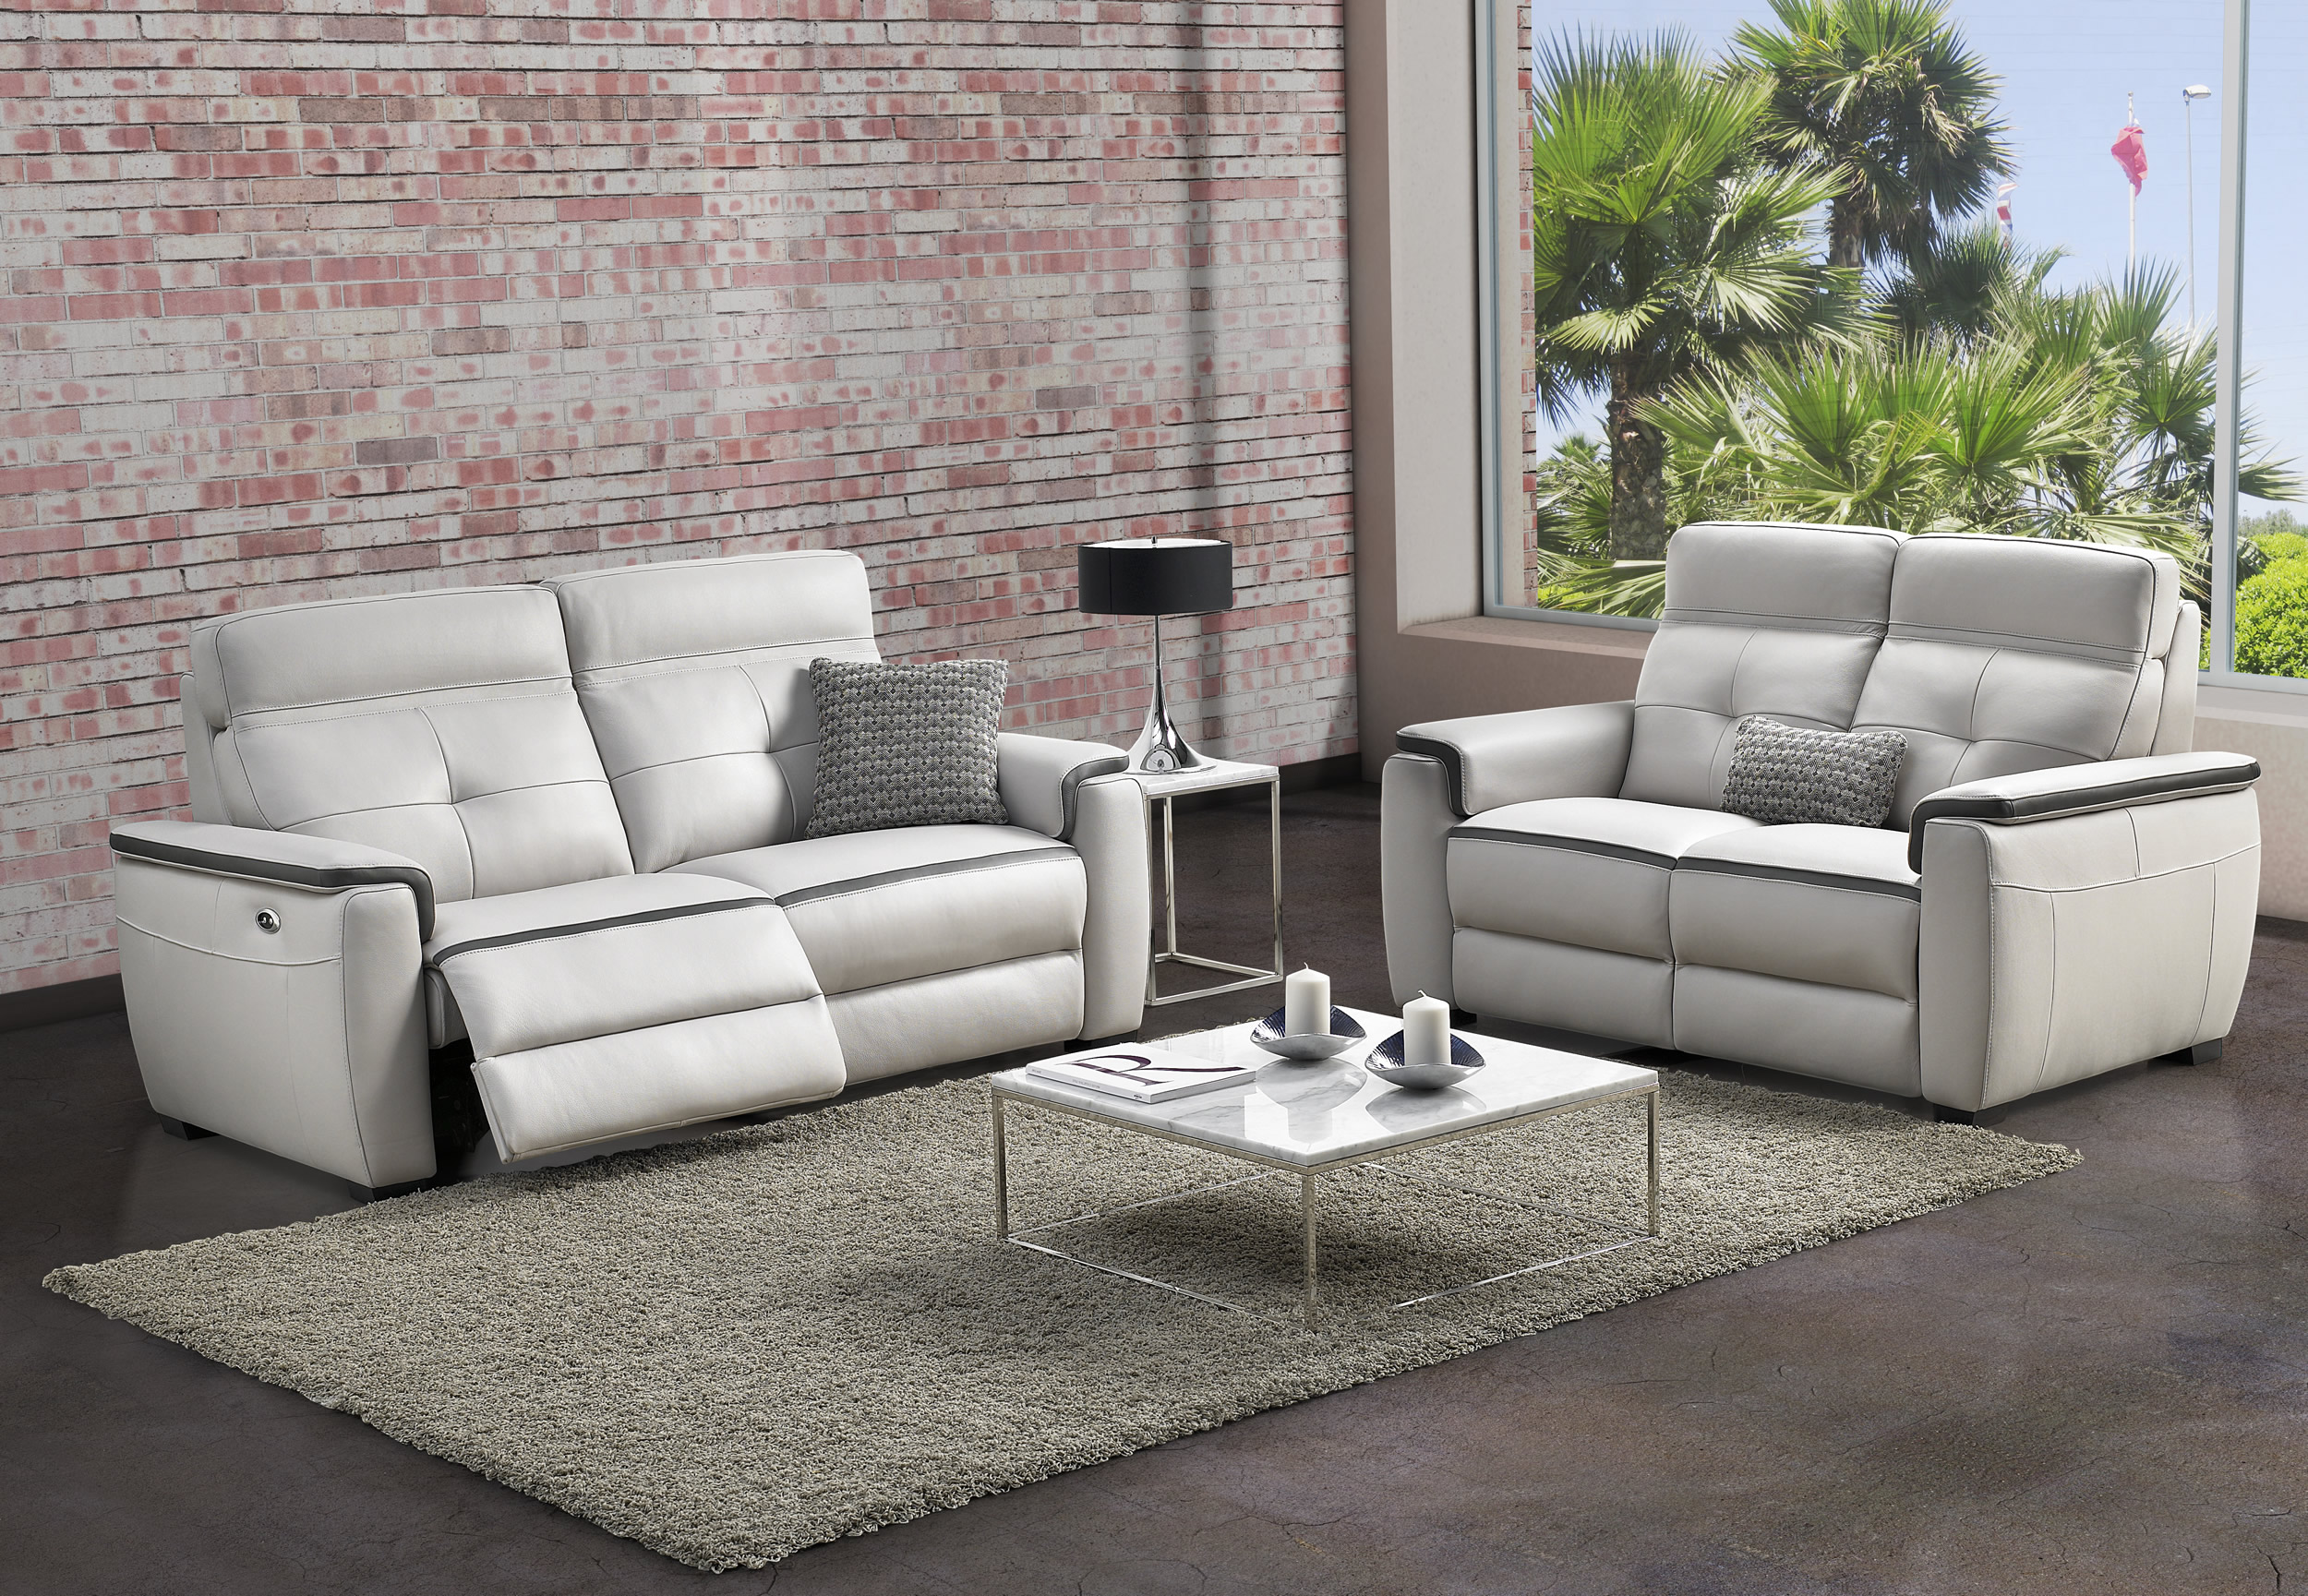 denis divani italia living produzione divani. Black Bedroom Furniture Sets. Home Design Ideas